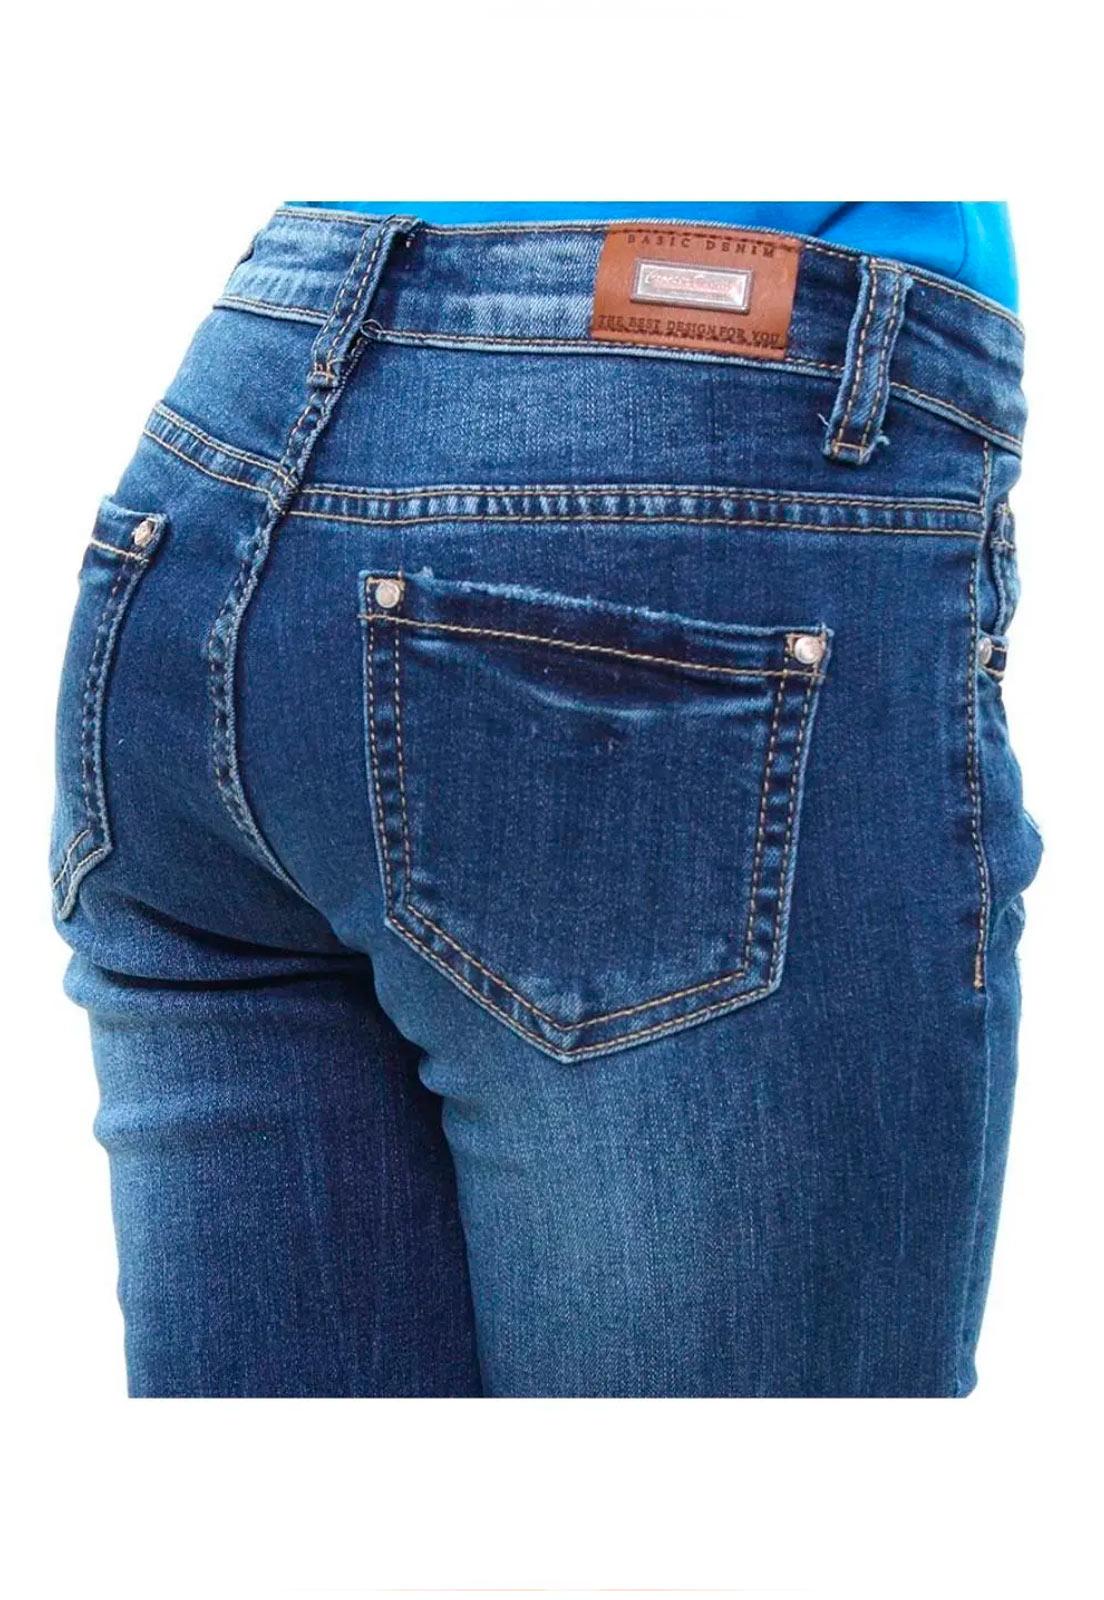 Calça Jeans Skinny Juvenil Feminina Crocker - 45931  - CROCKER JEANS